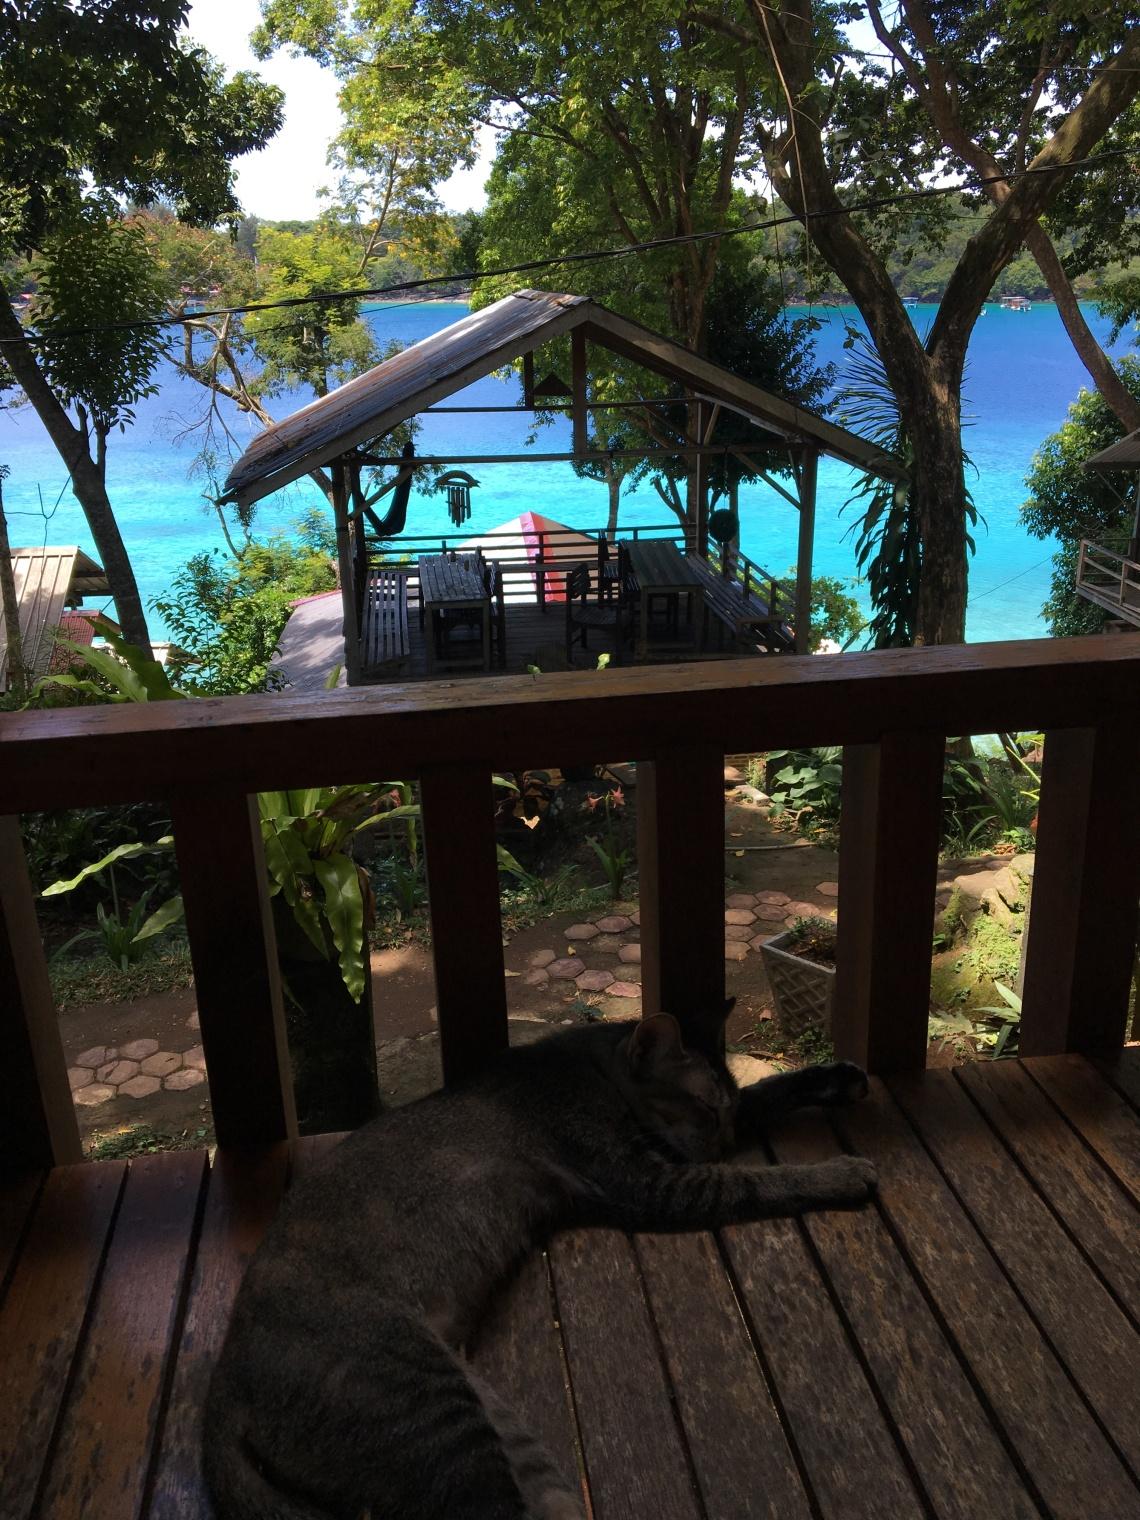 Pulau Weh 1